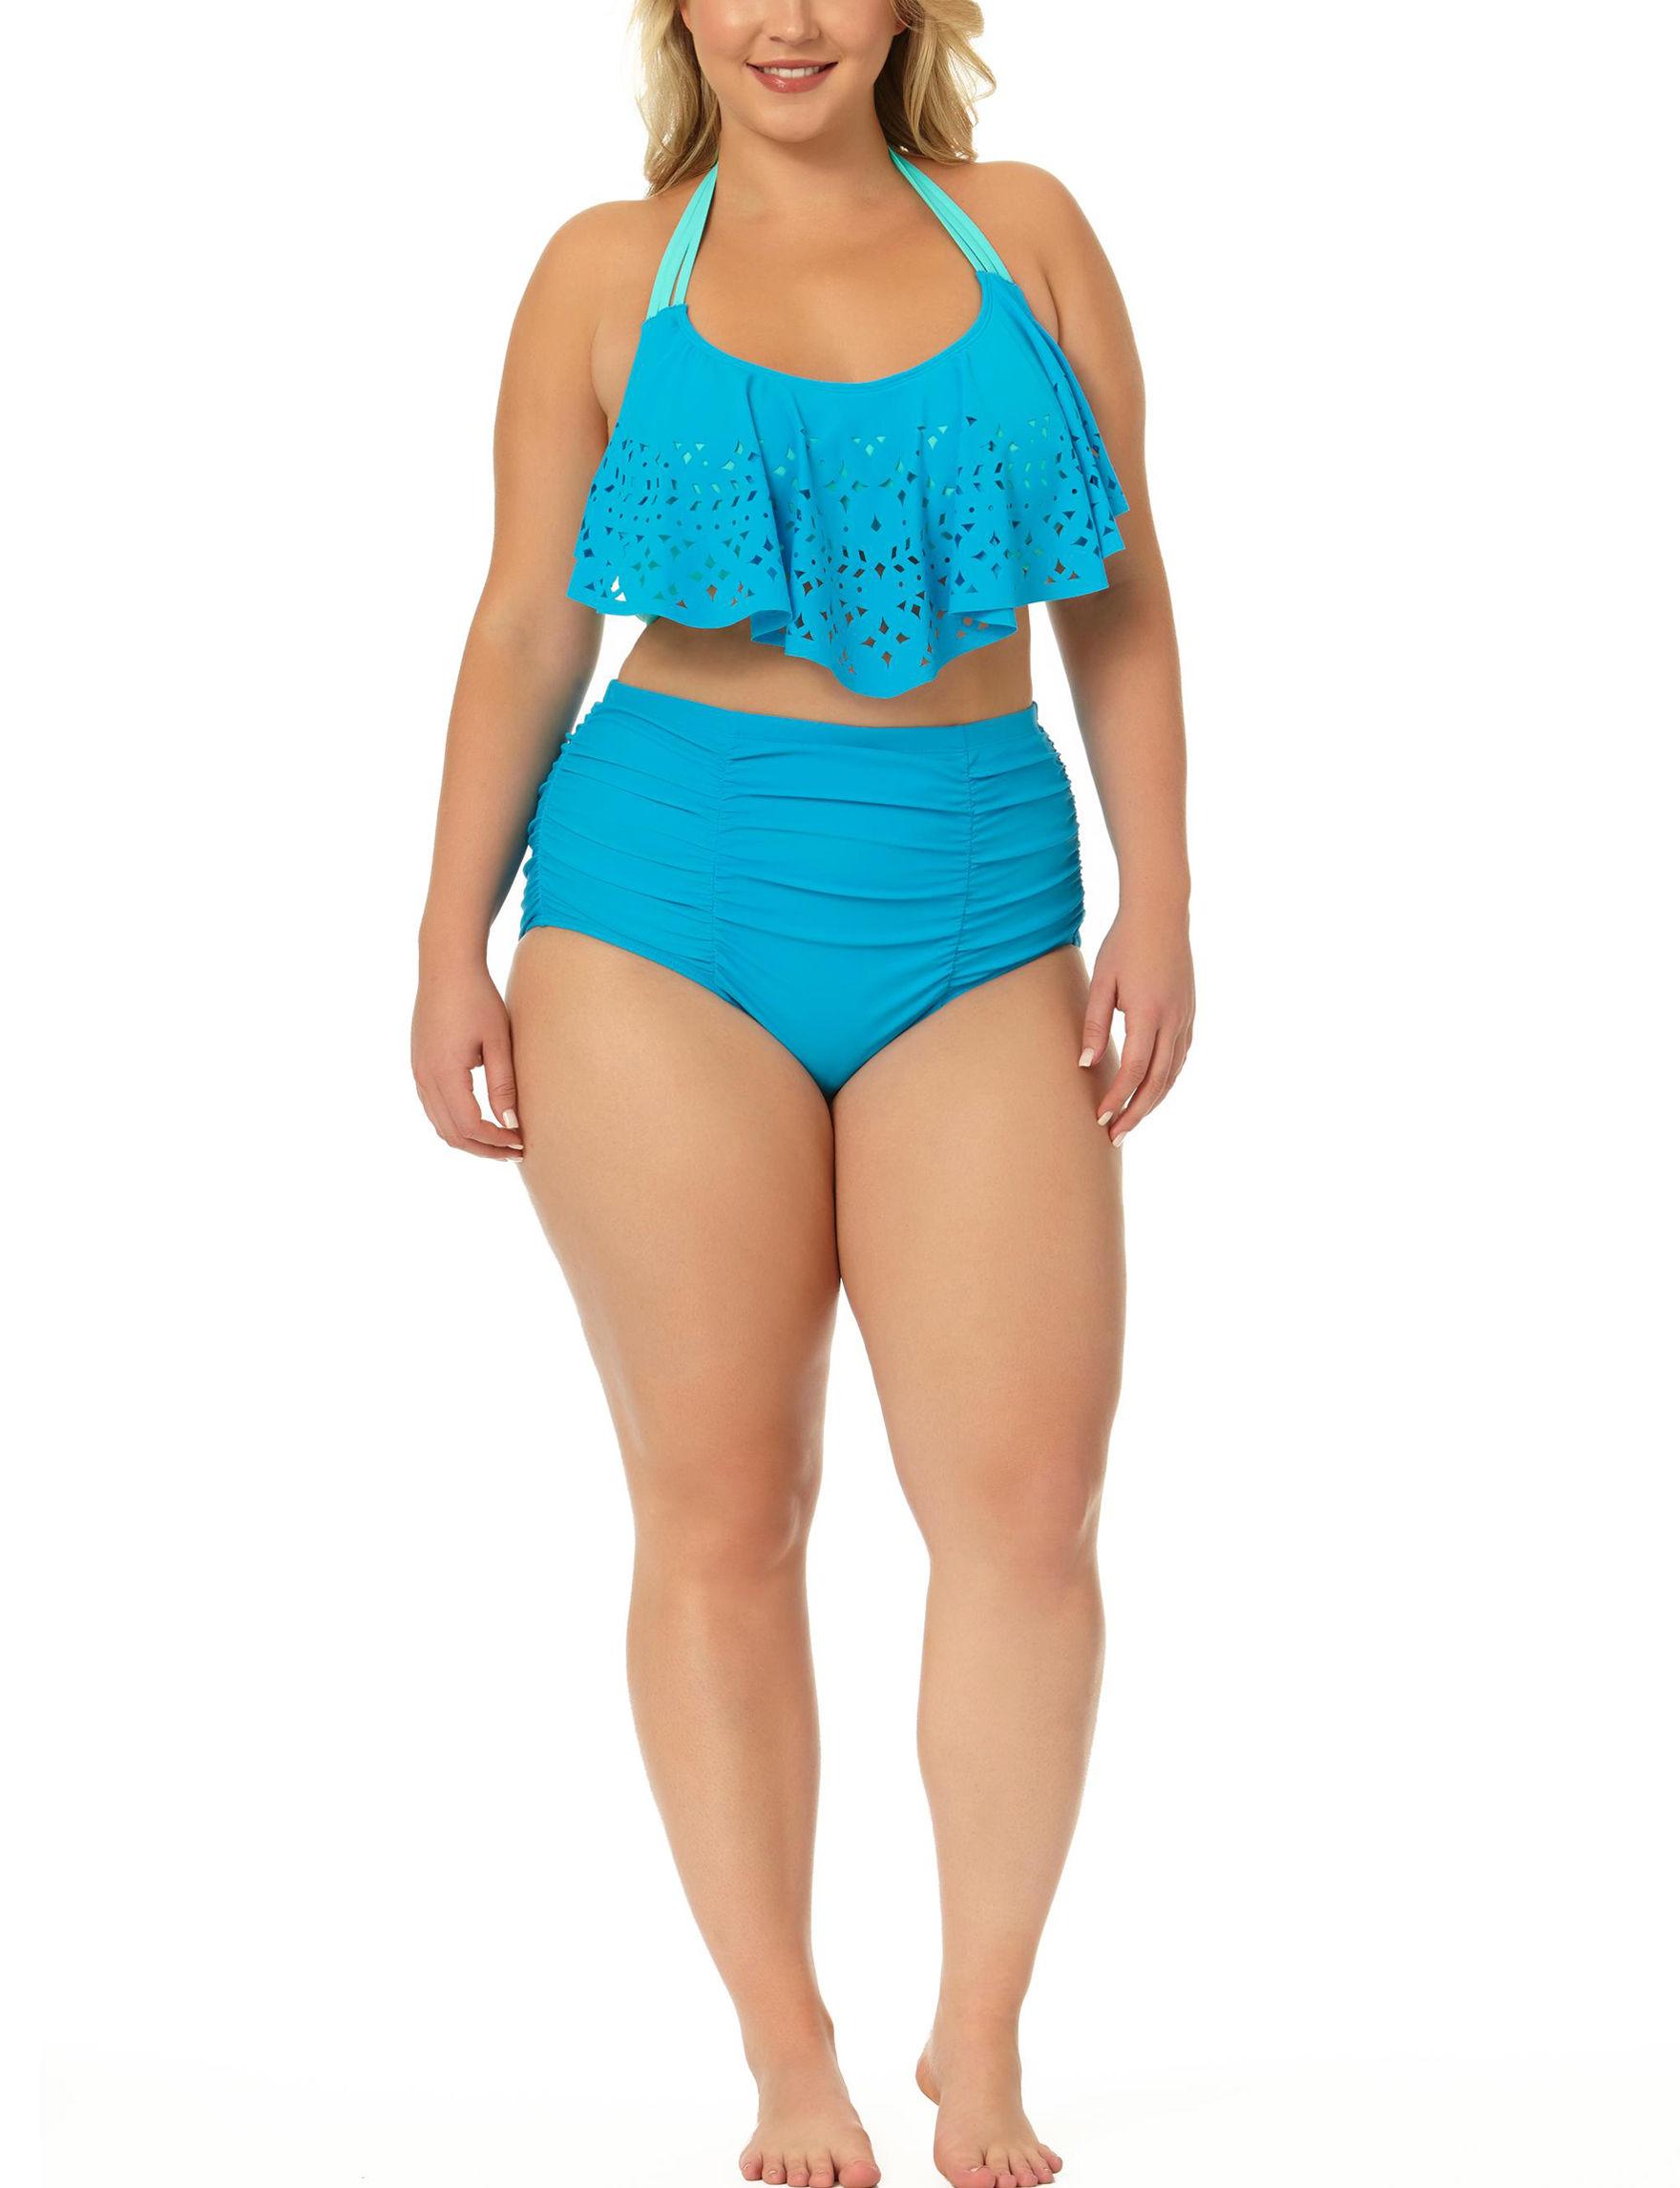 Allure Turquoise Swimsuit Bottoms High Waist